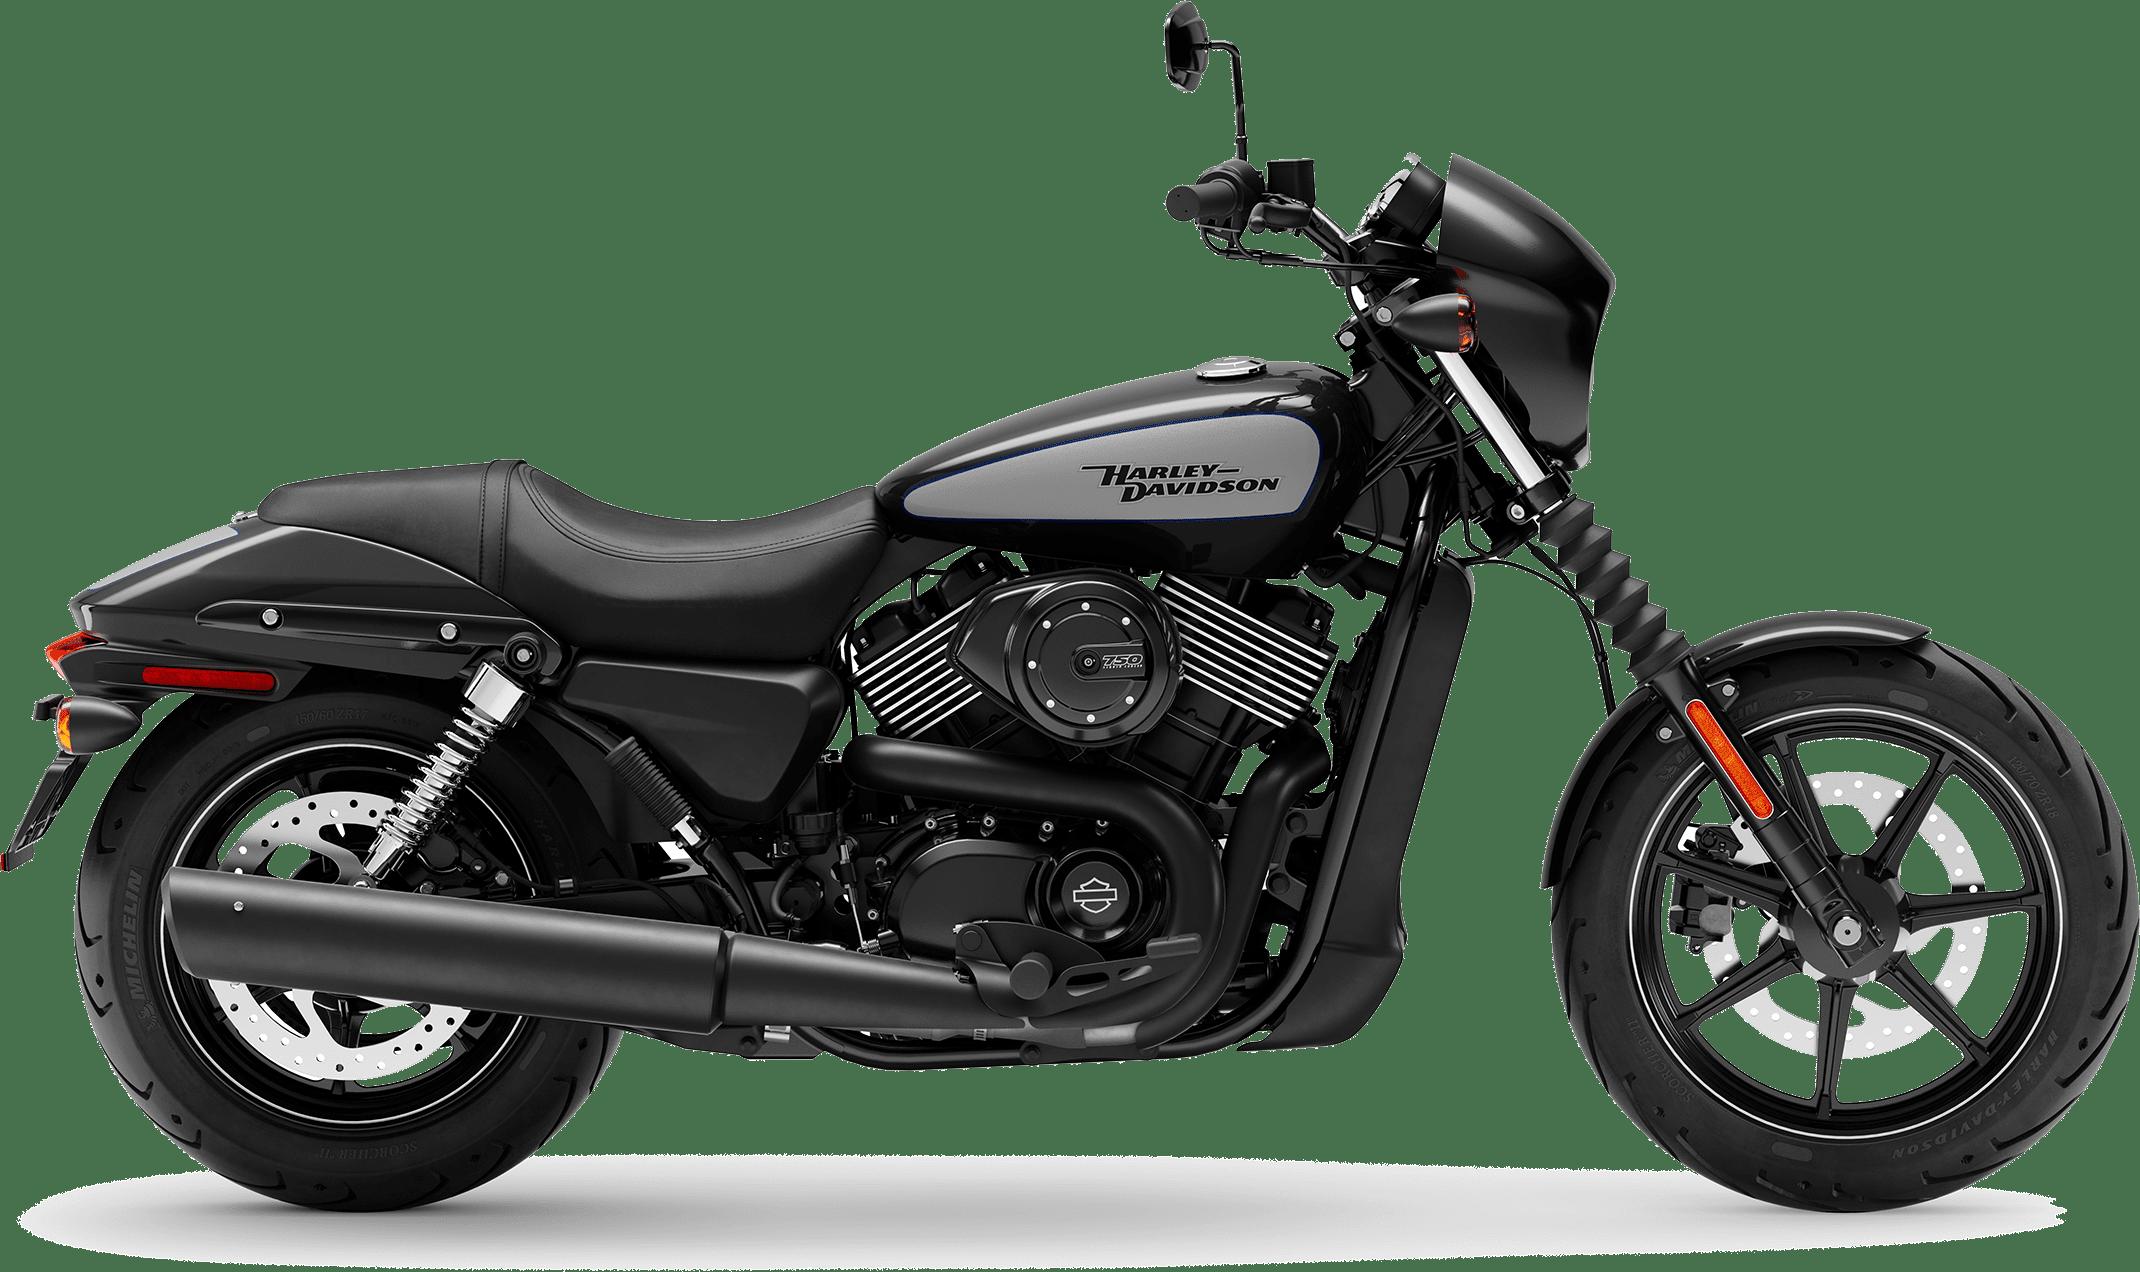 2019 Harley-Davidson H-D Street 750 Vivid Black Deluxe